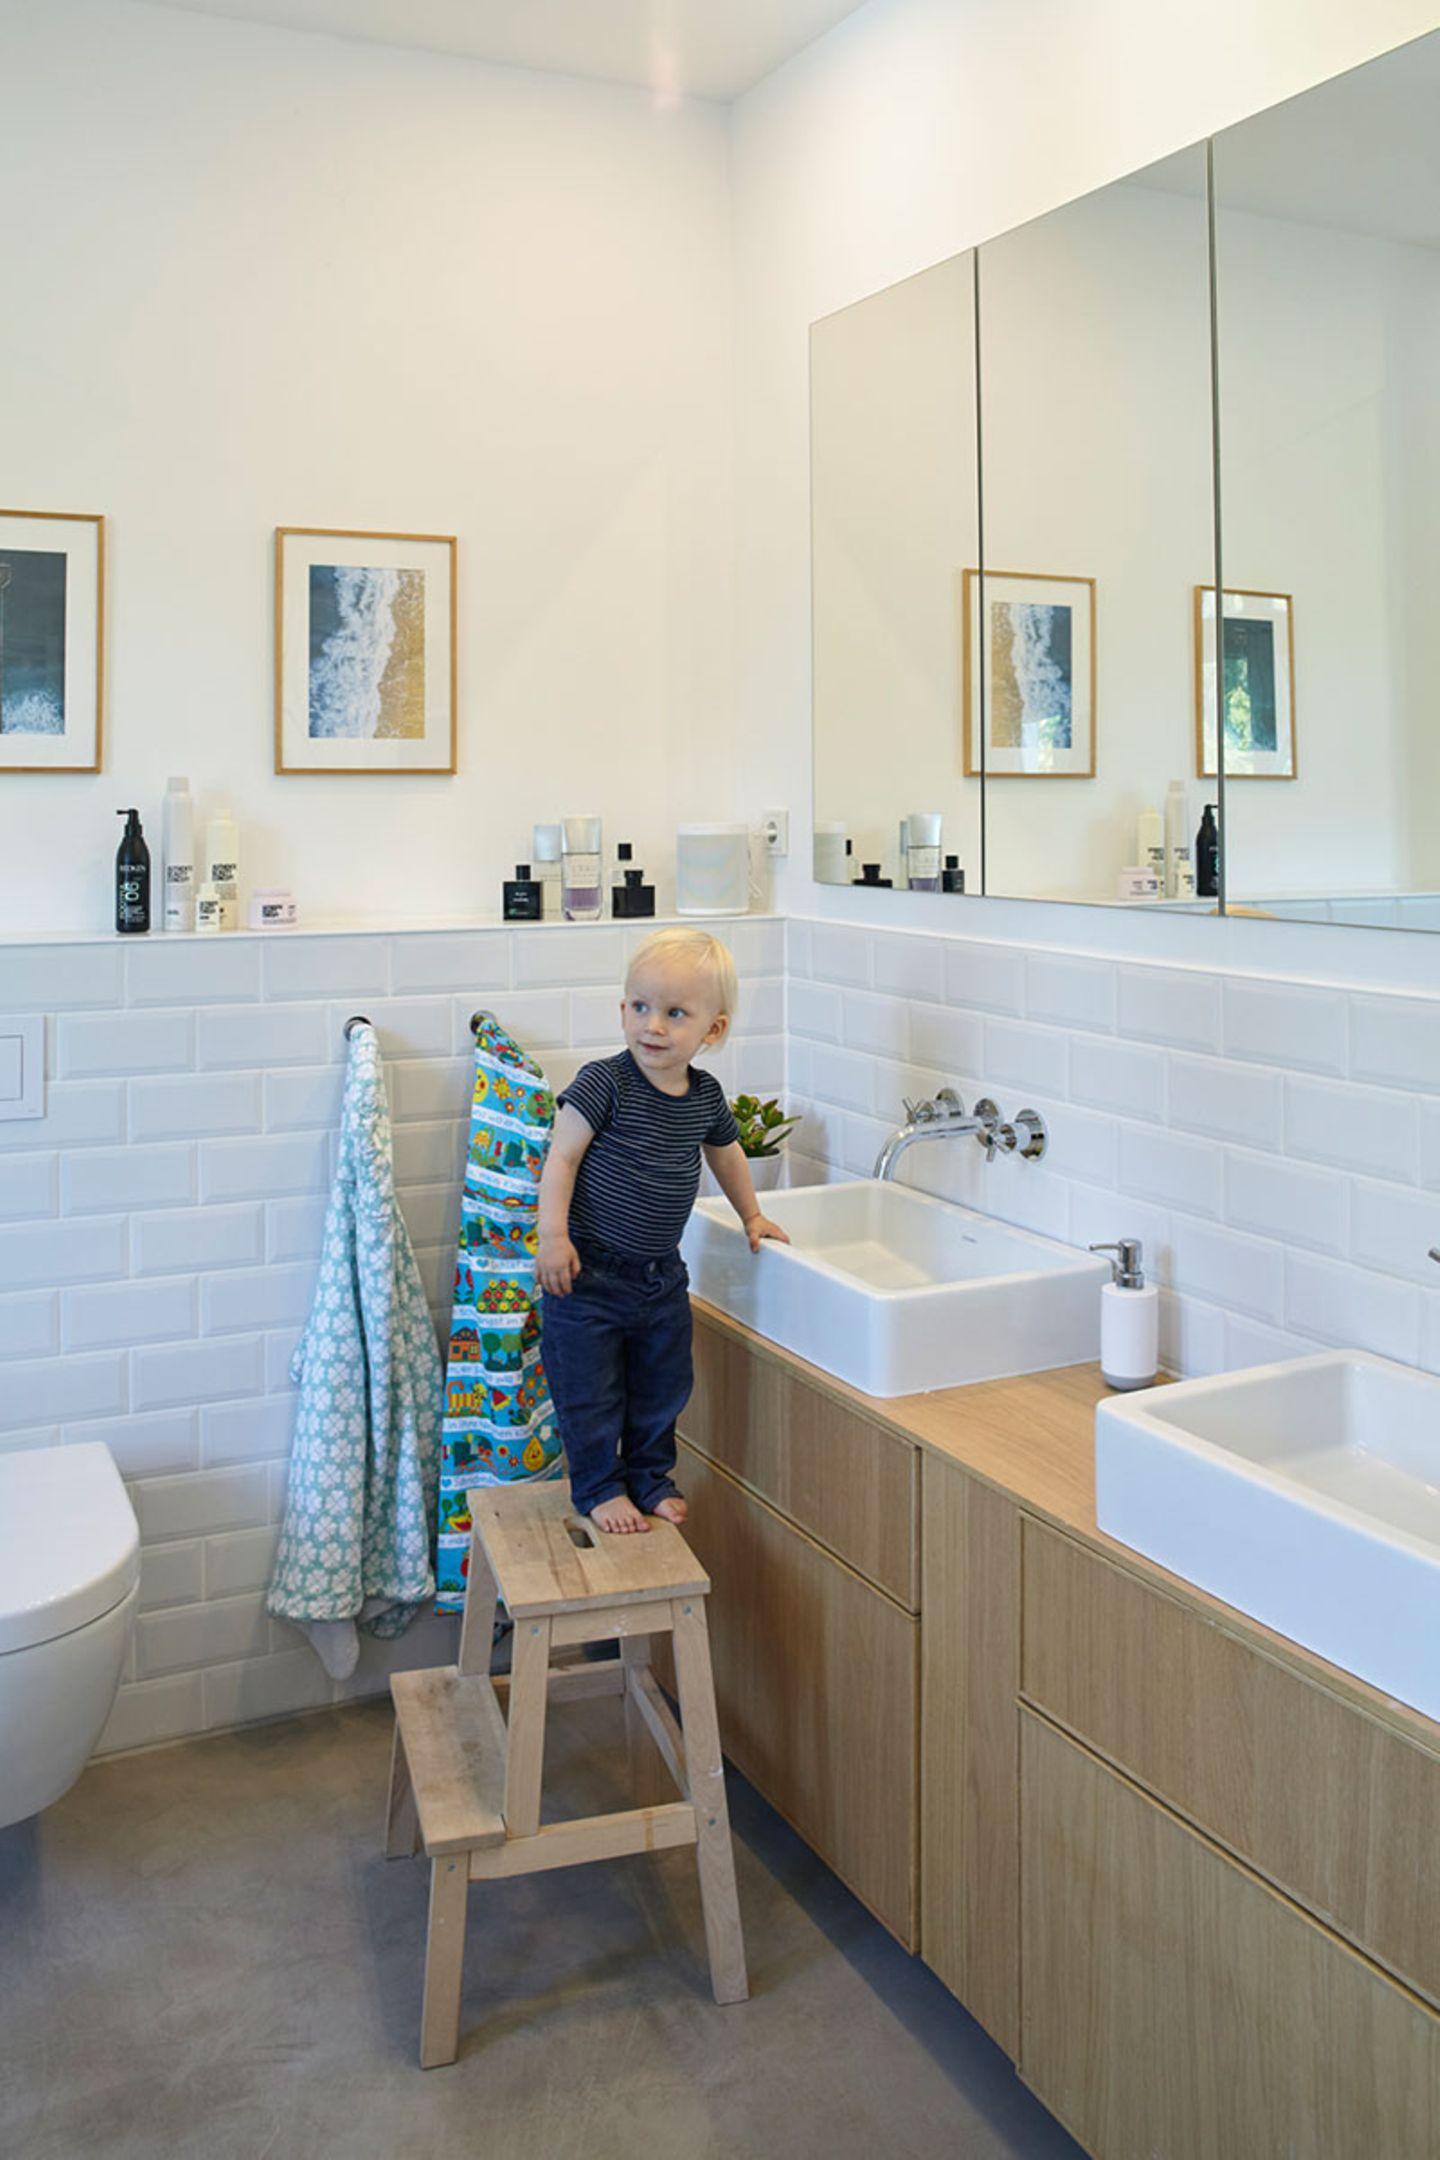 Doppelhaushälfte Badezimmer